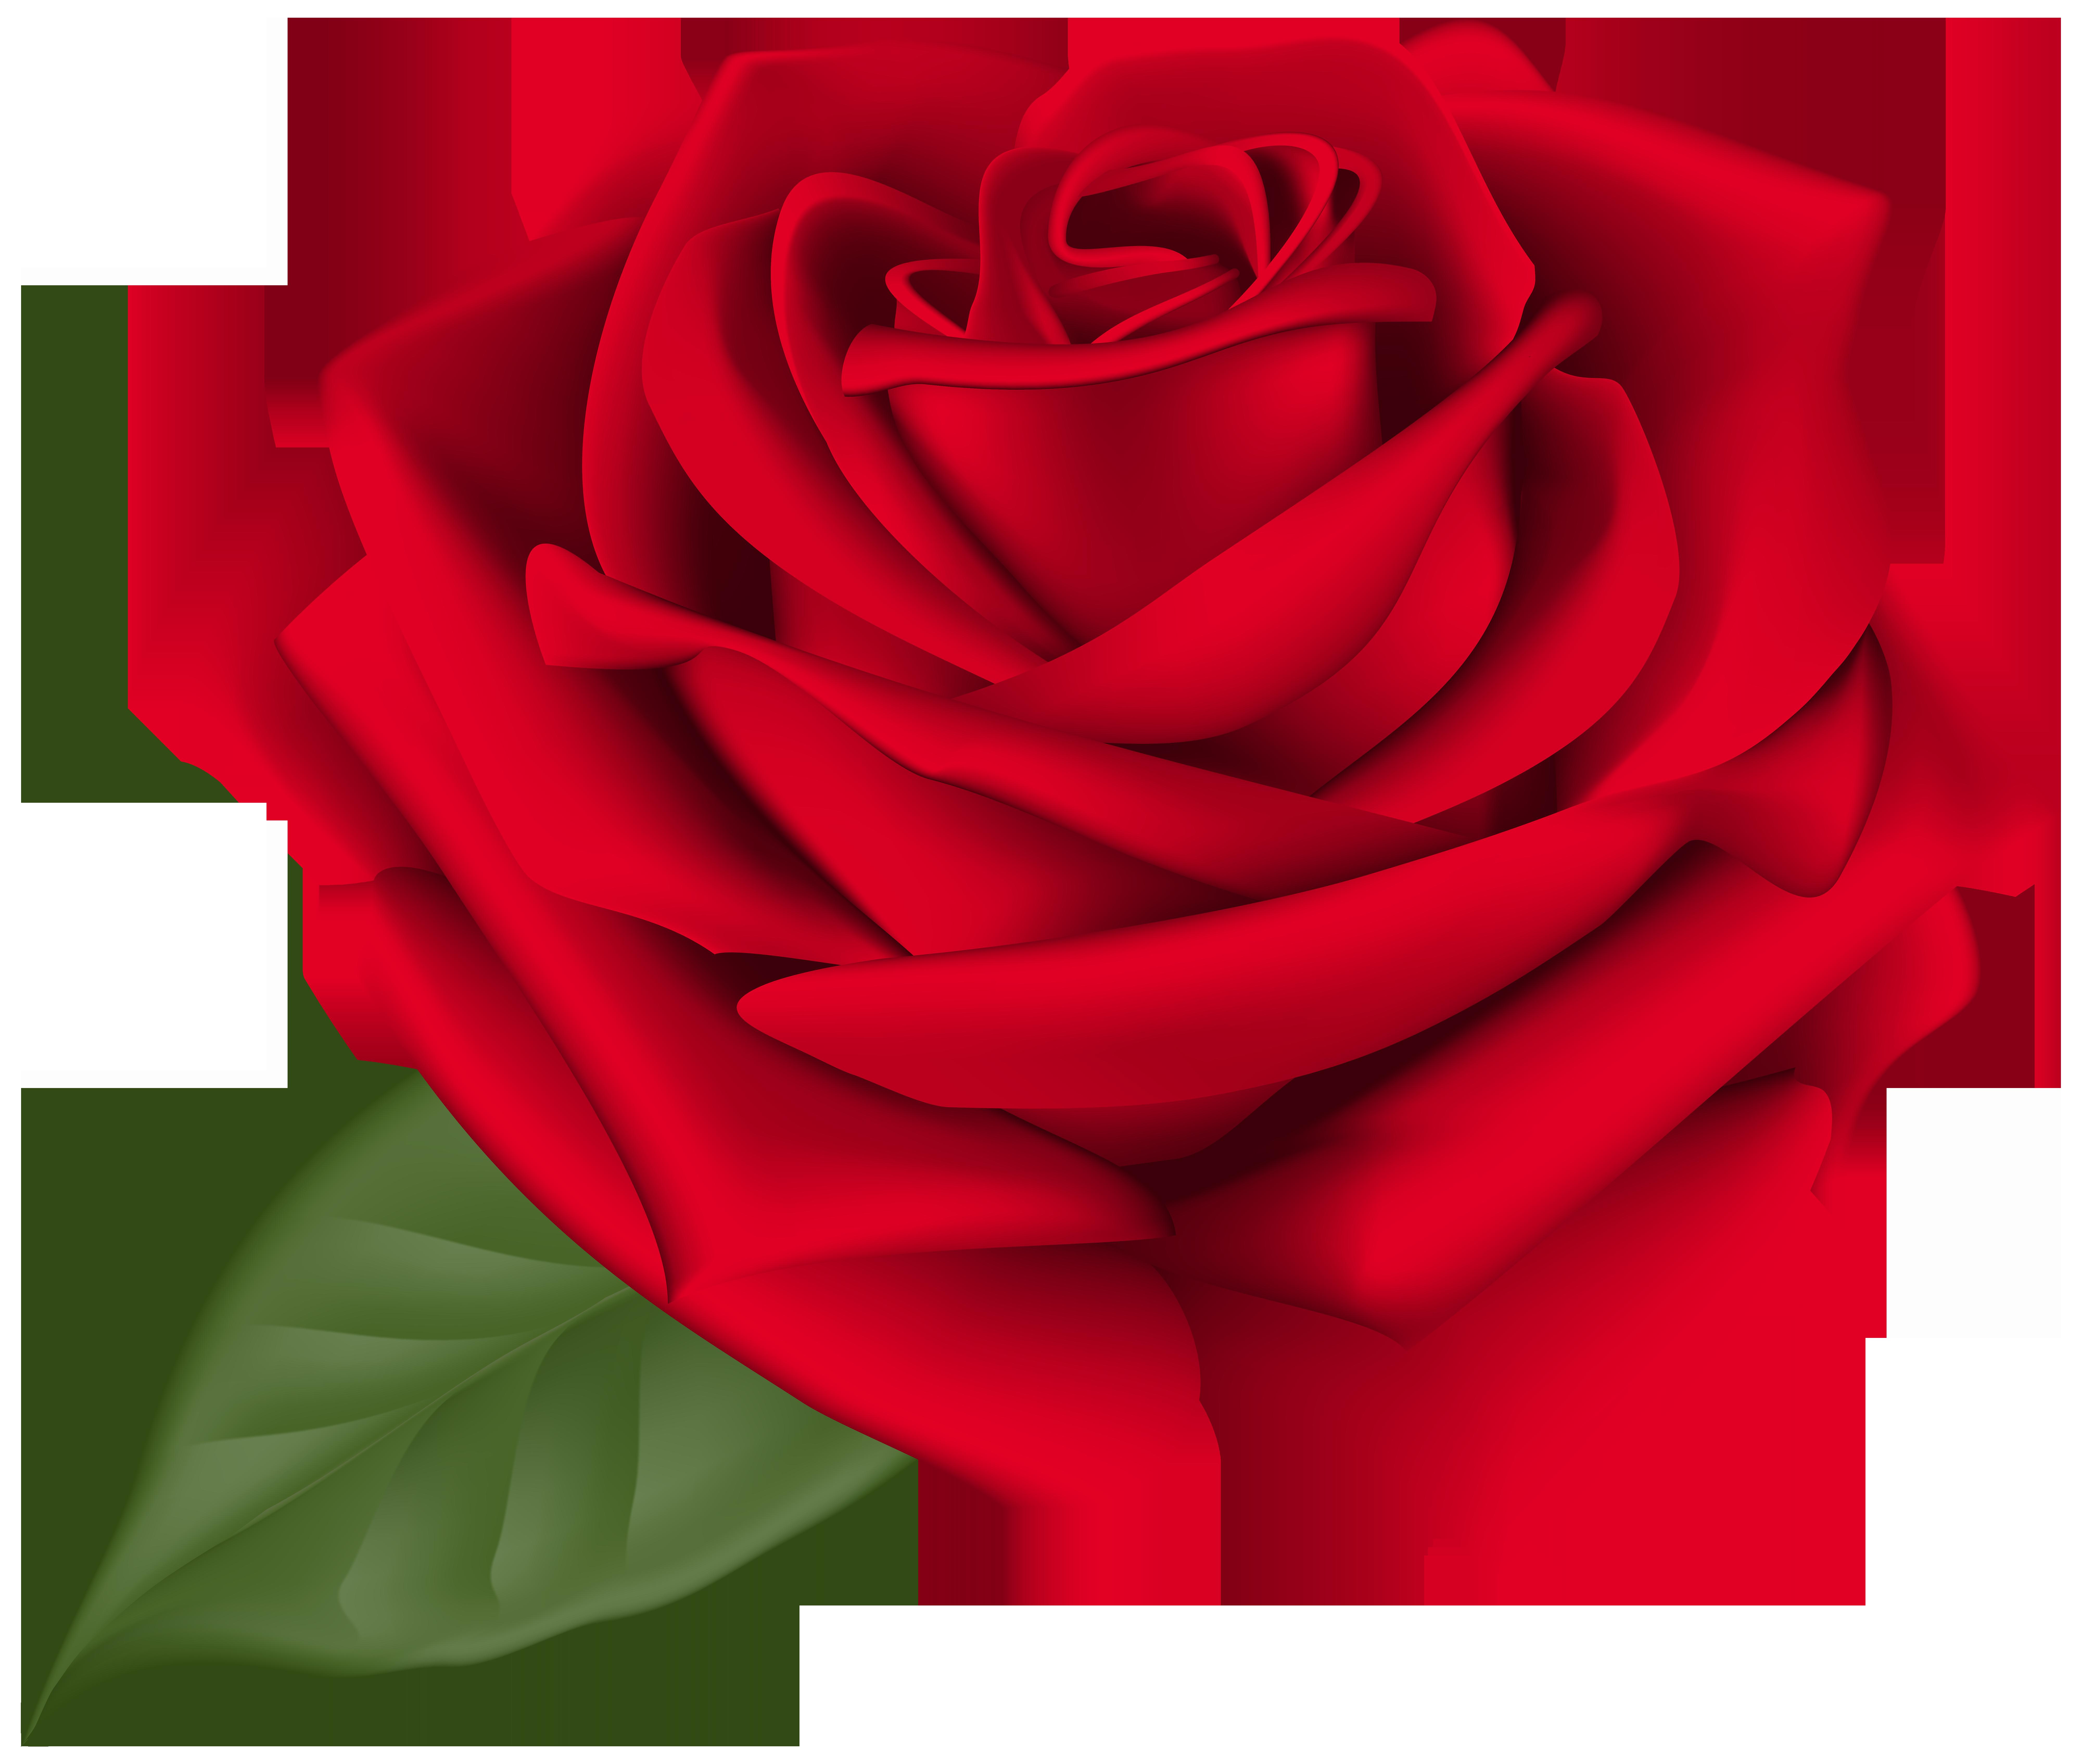 8000x6777 Rose Red Transparent Png Clip Art Imageu200b Gallery Yopriceville